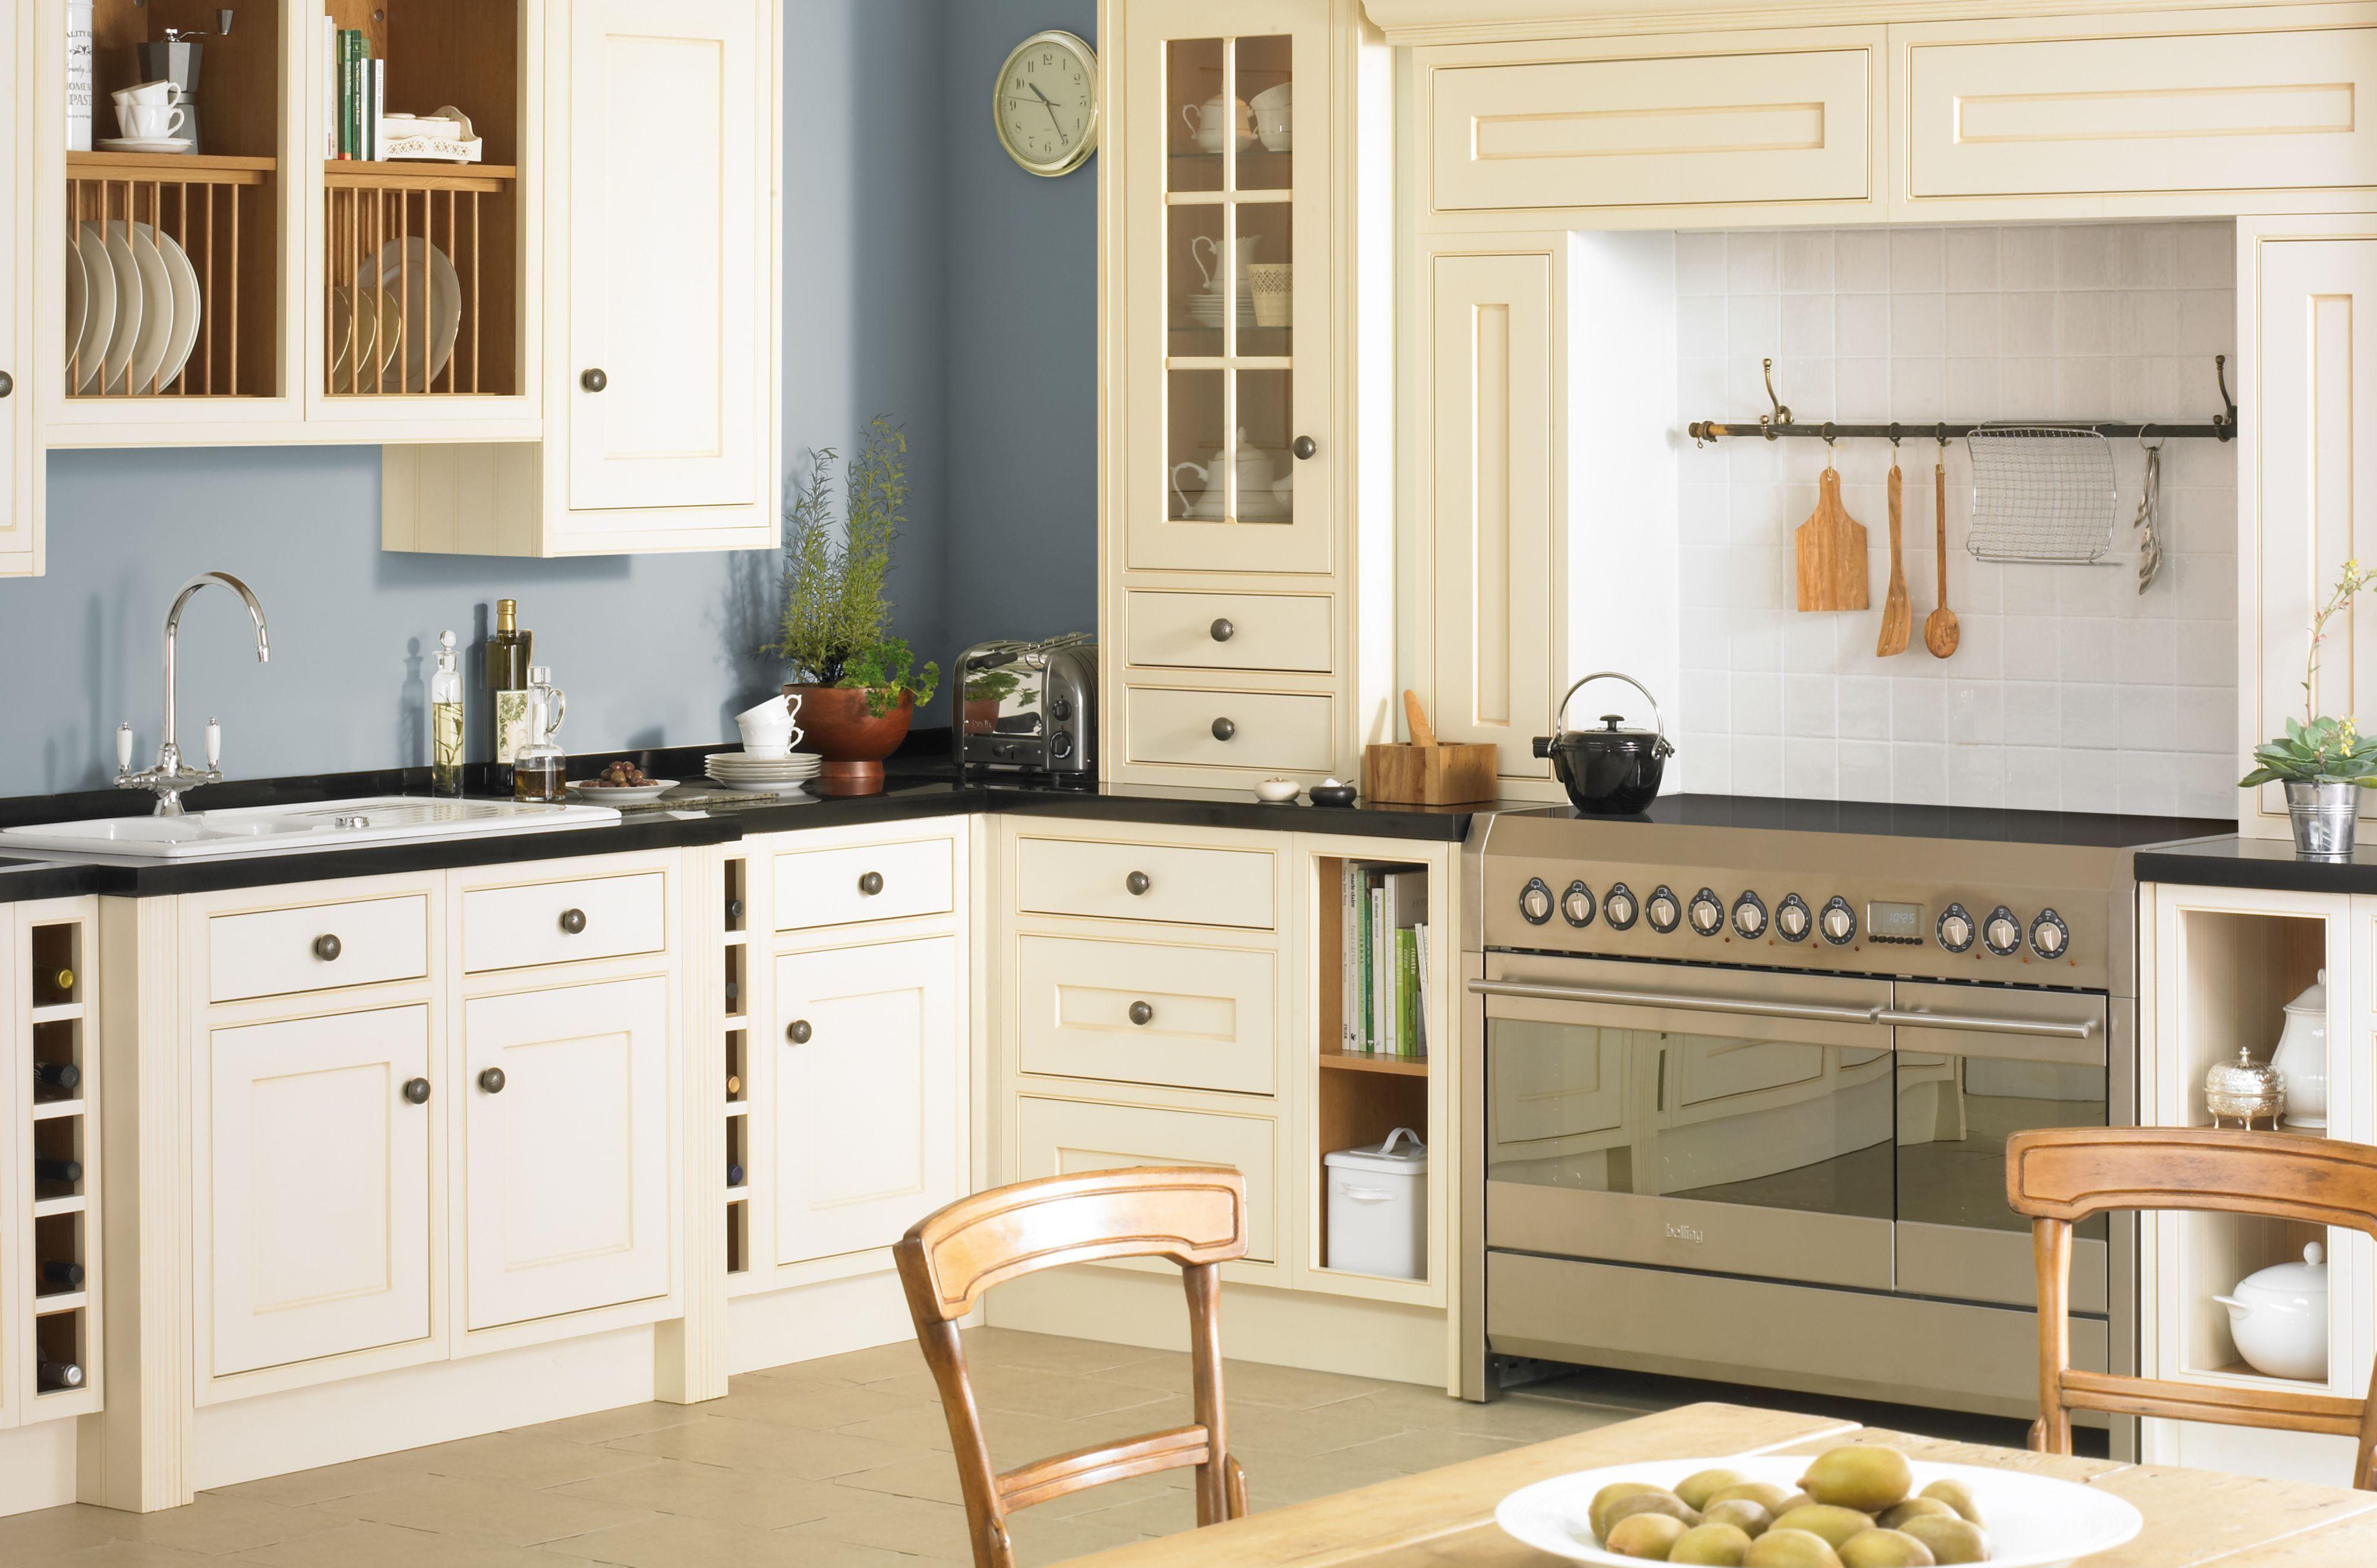 Image of the Woburn kitchen